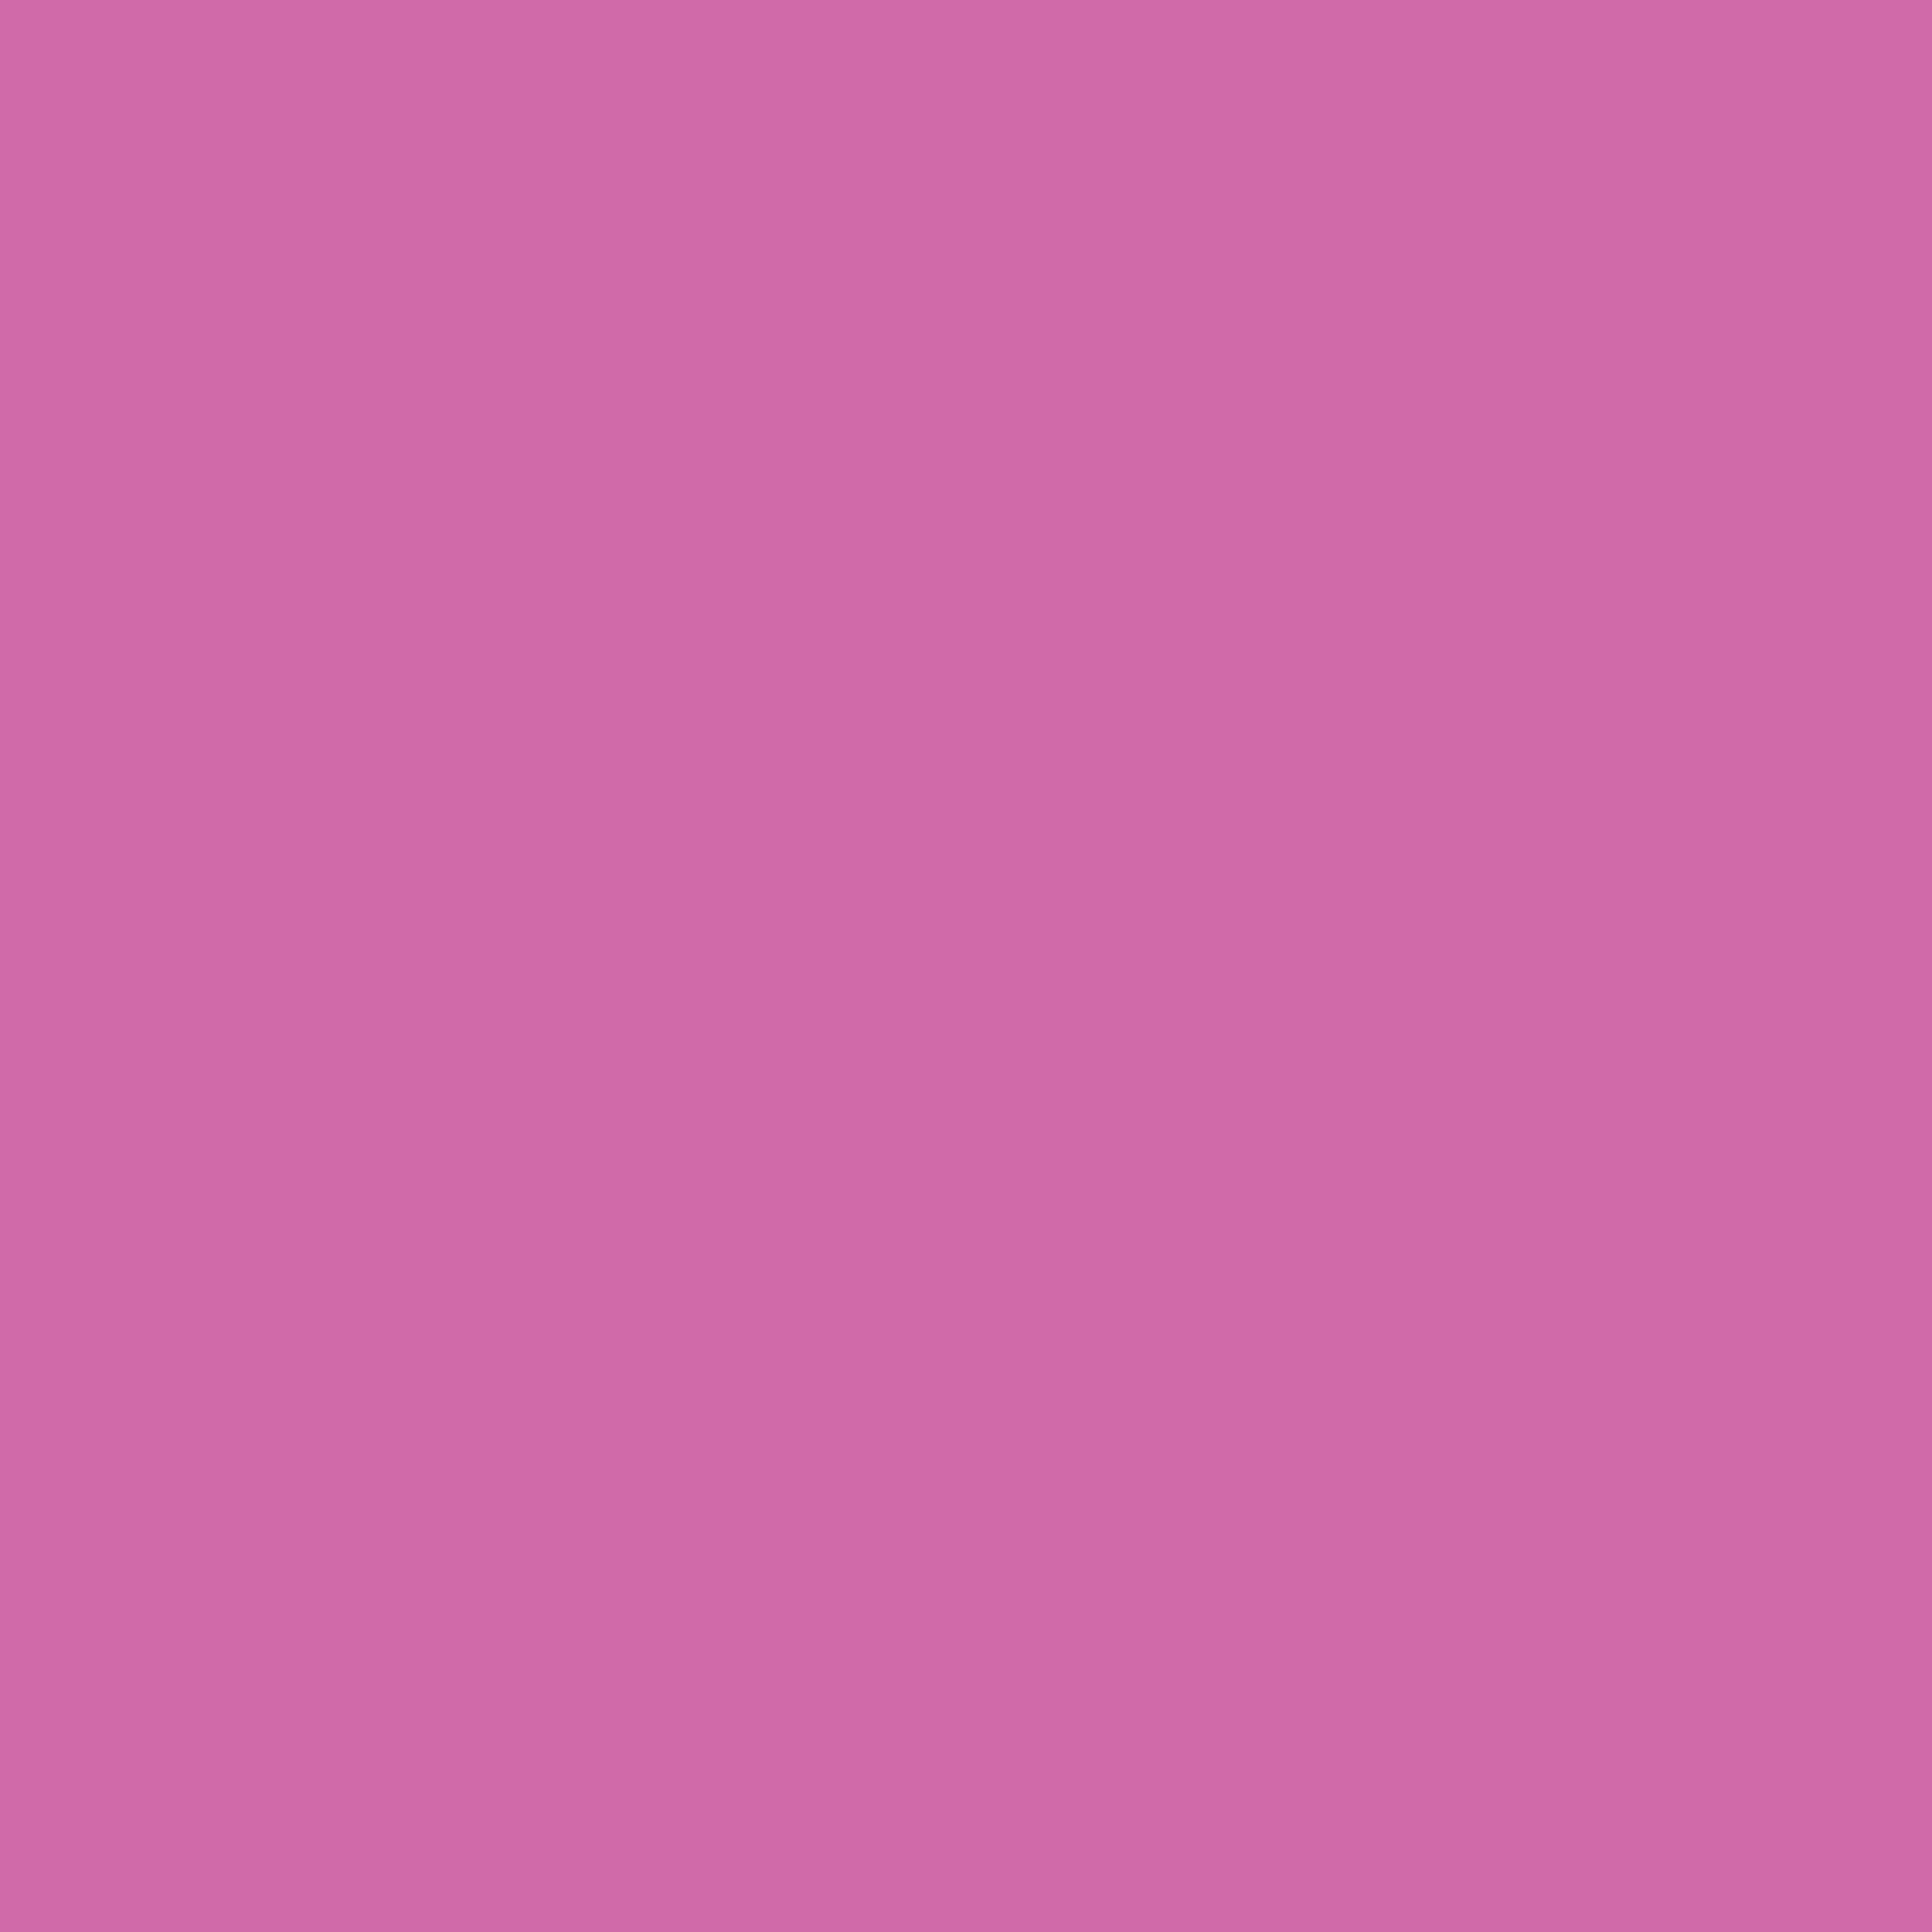 3600x3600 Super Pink Solid Color Background